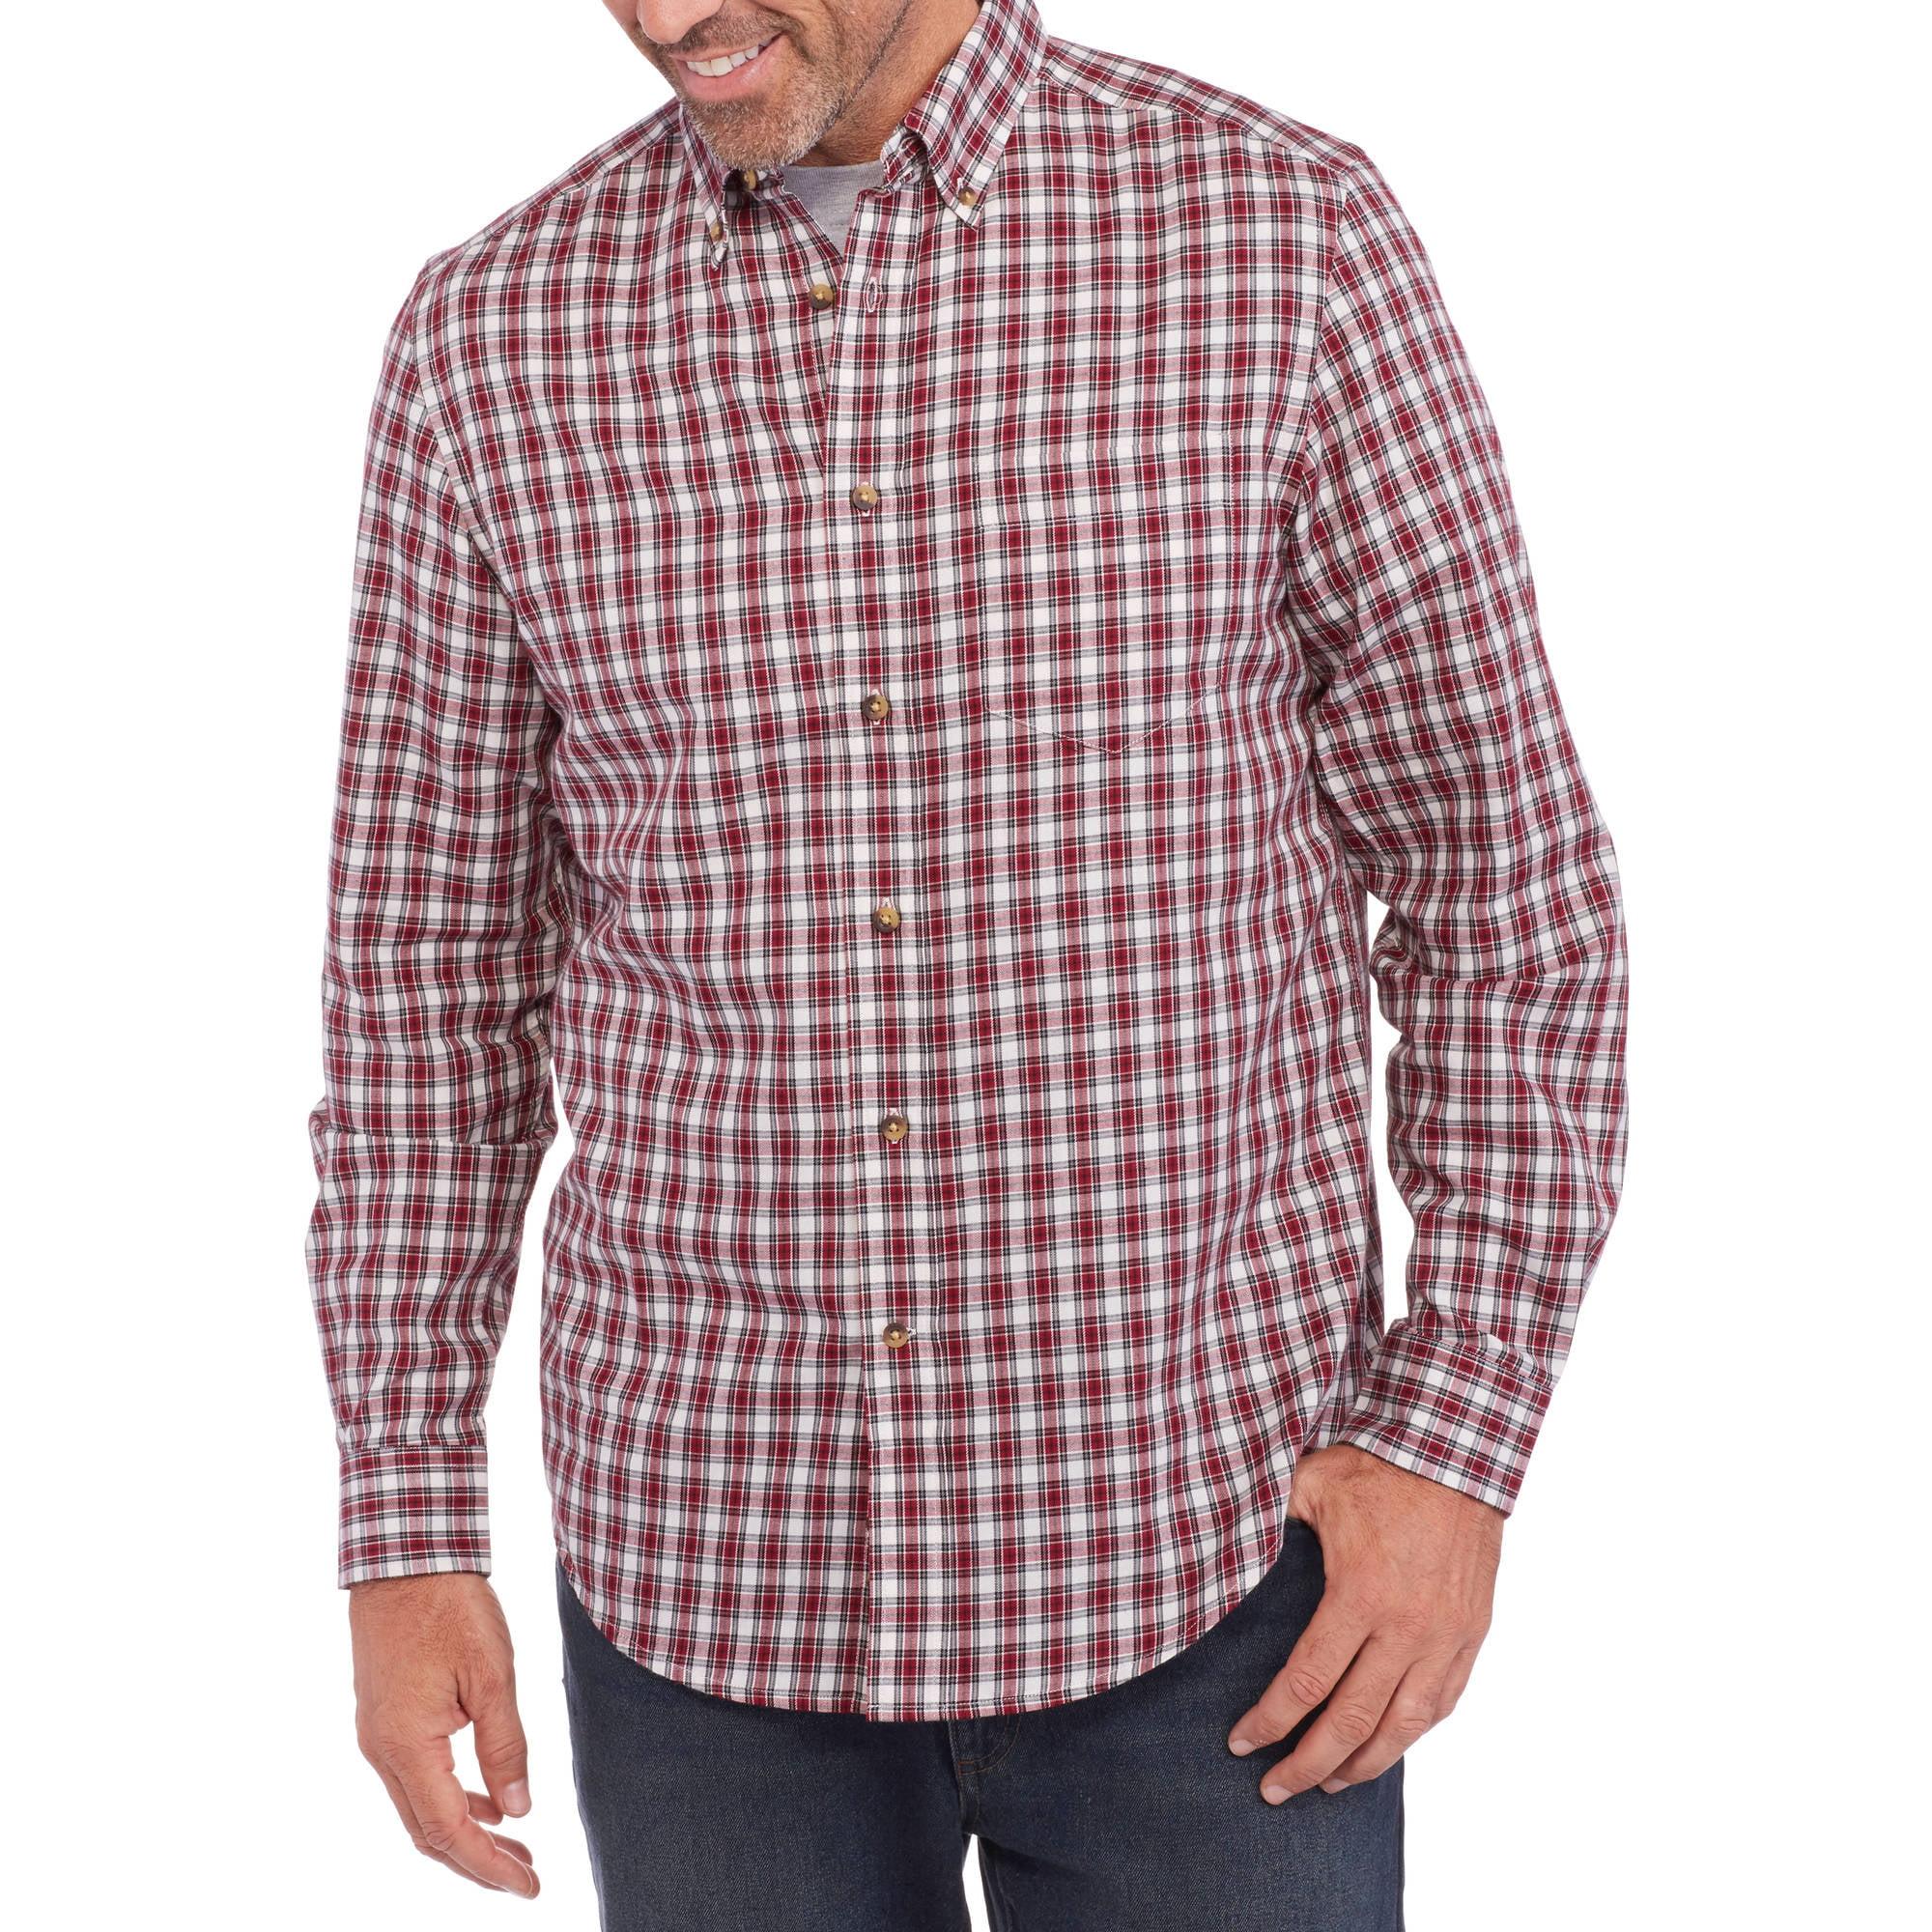 George Men's Long Sleeve Twill Plaid Shirt